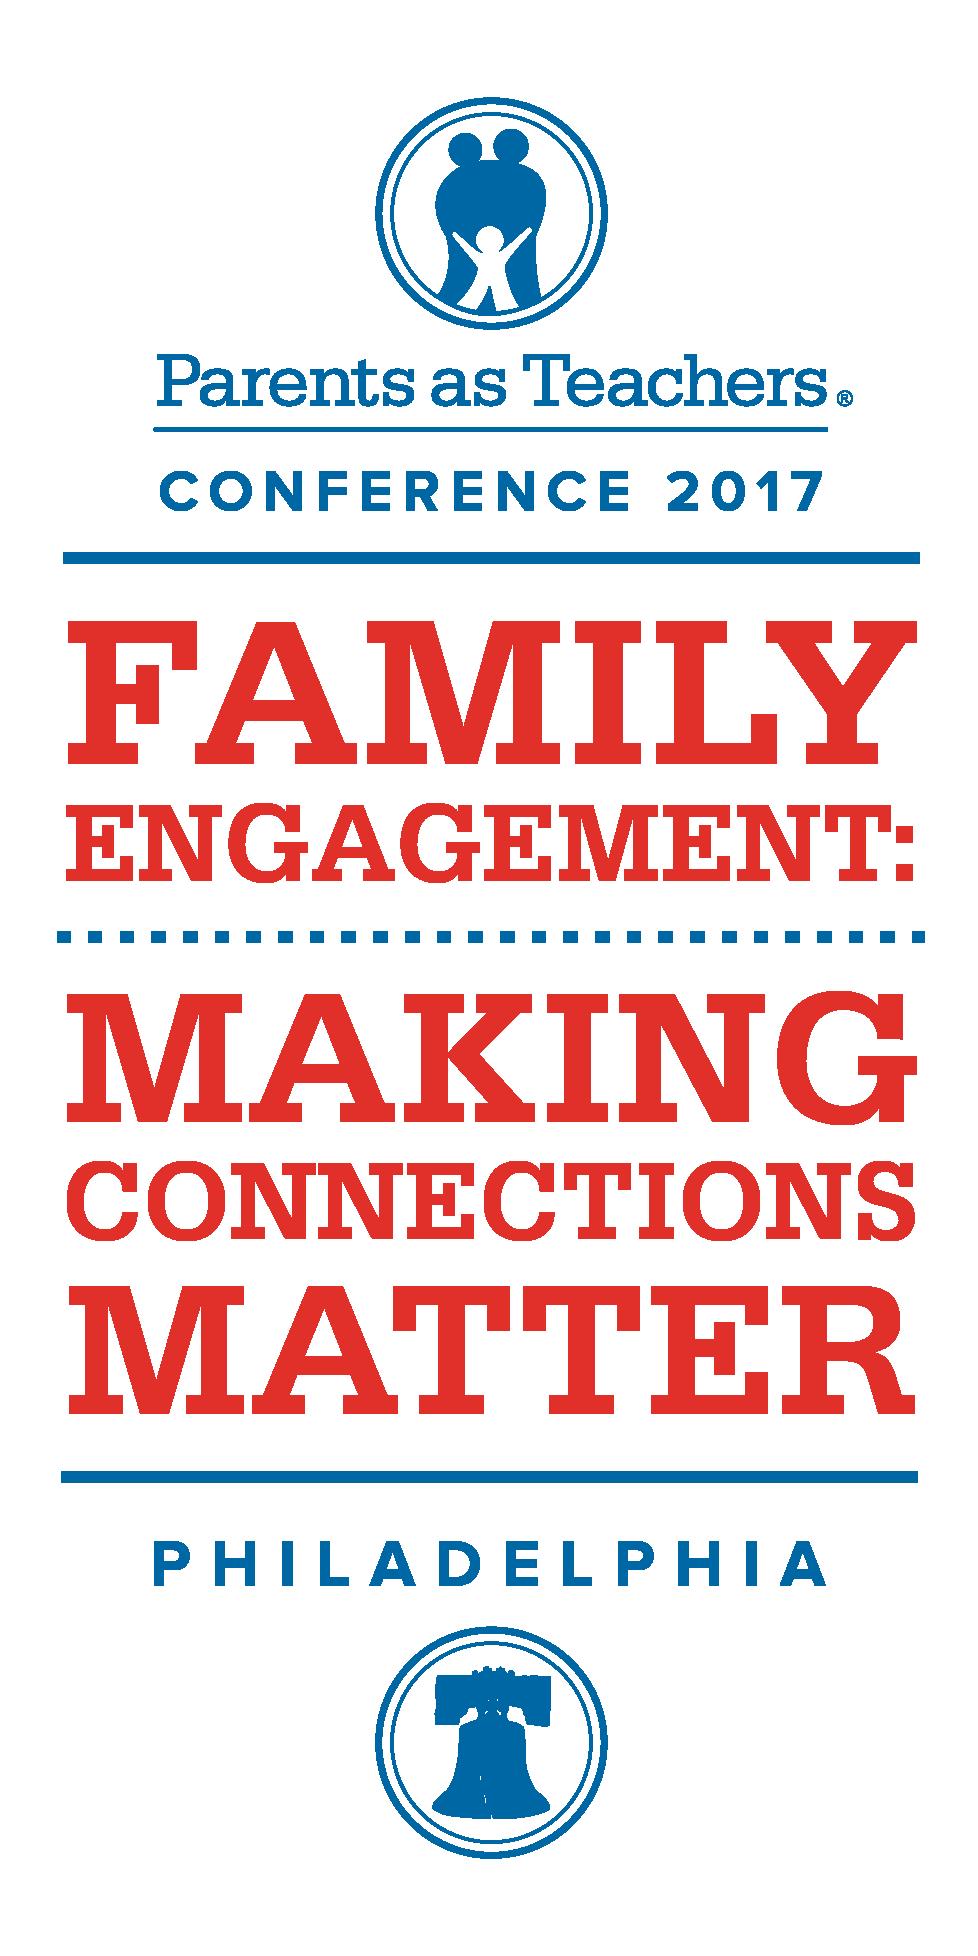 MakingConnectionsMatter_2017_Philadelphia_Chosen_OL_012617_1_Main Logo.png